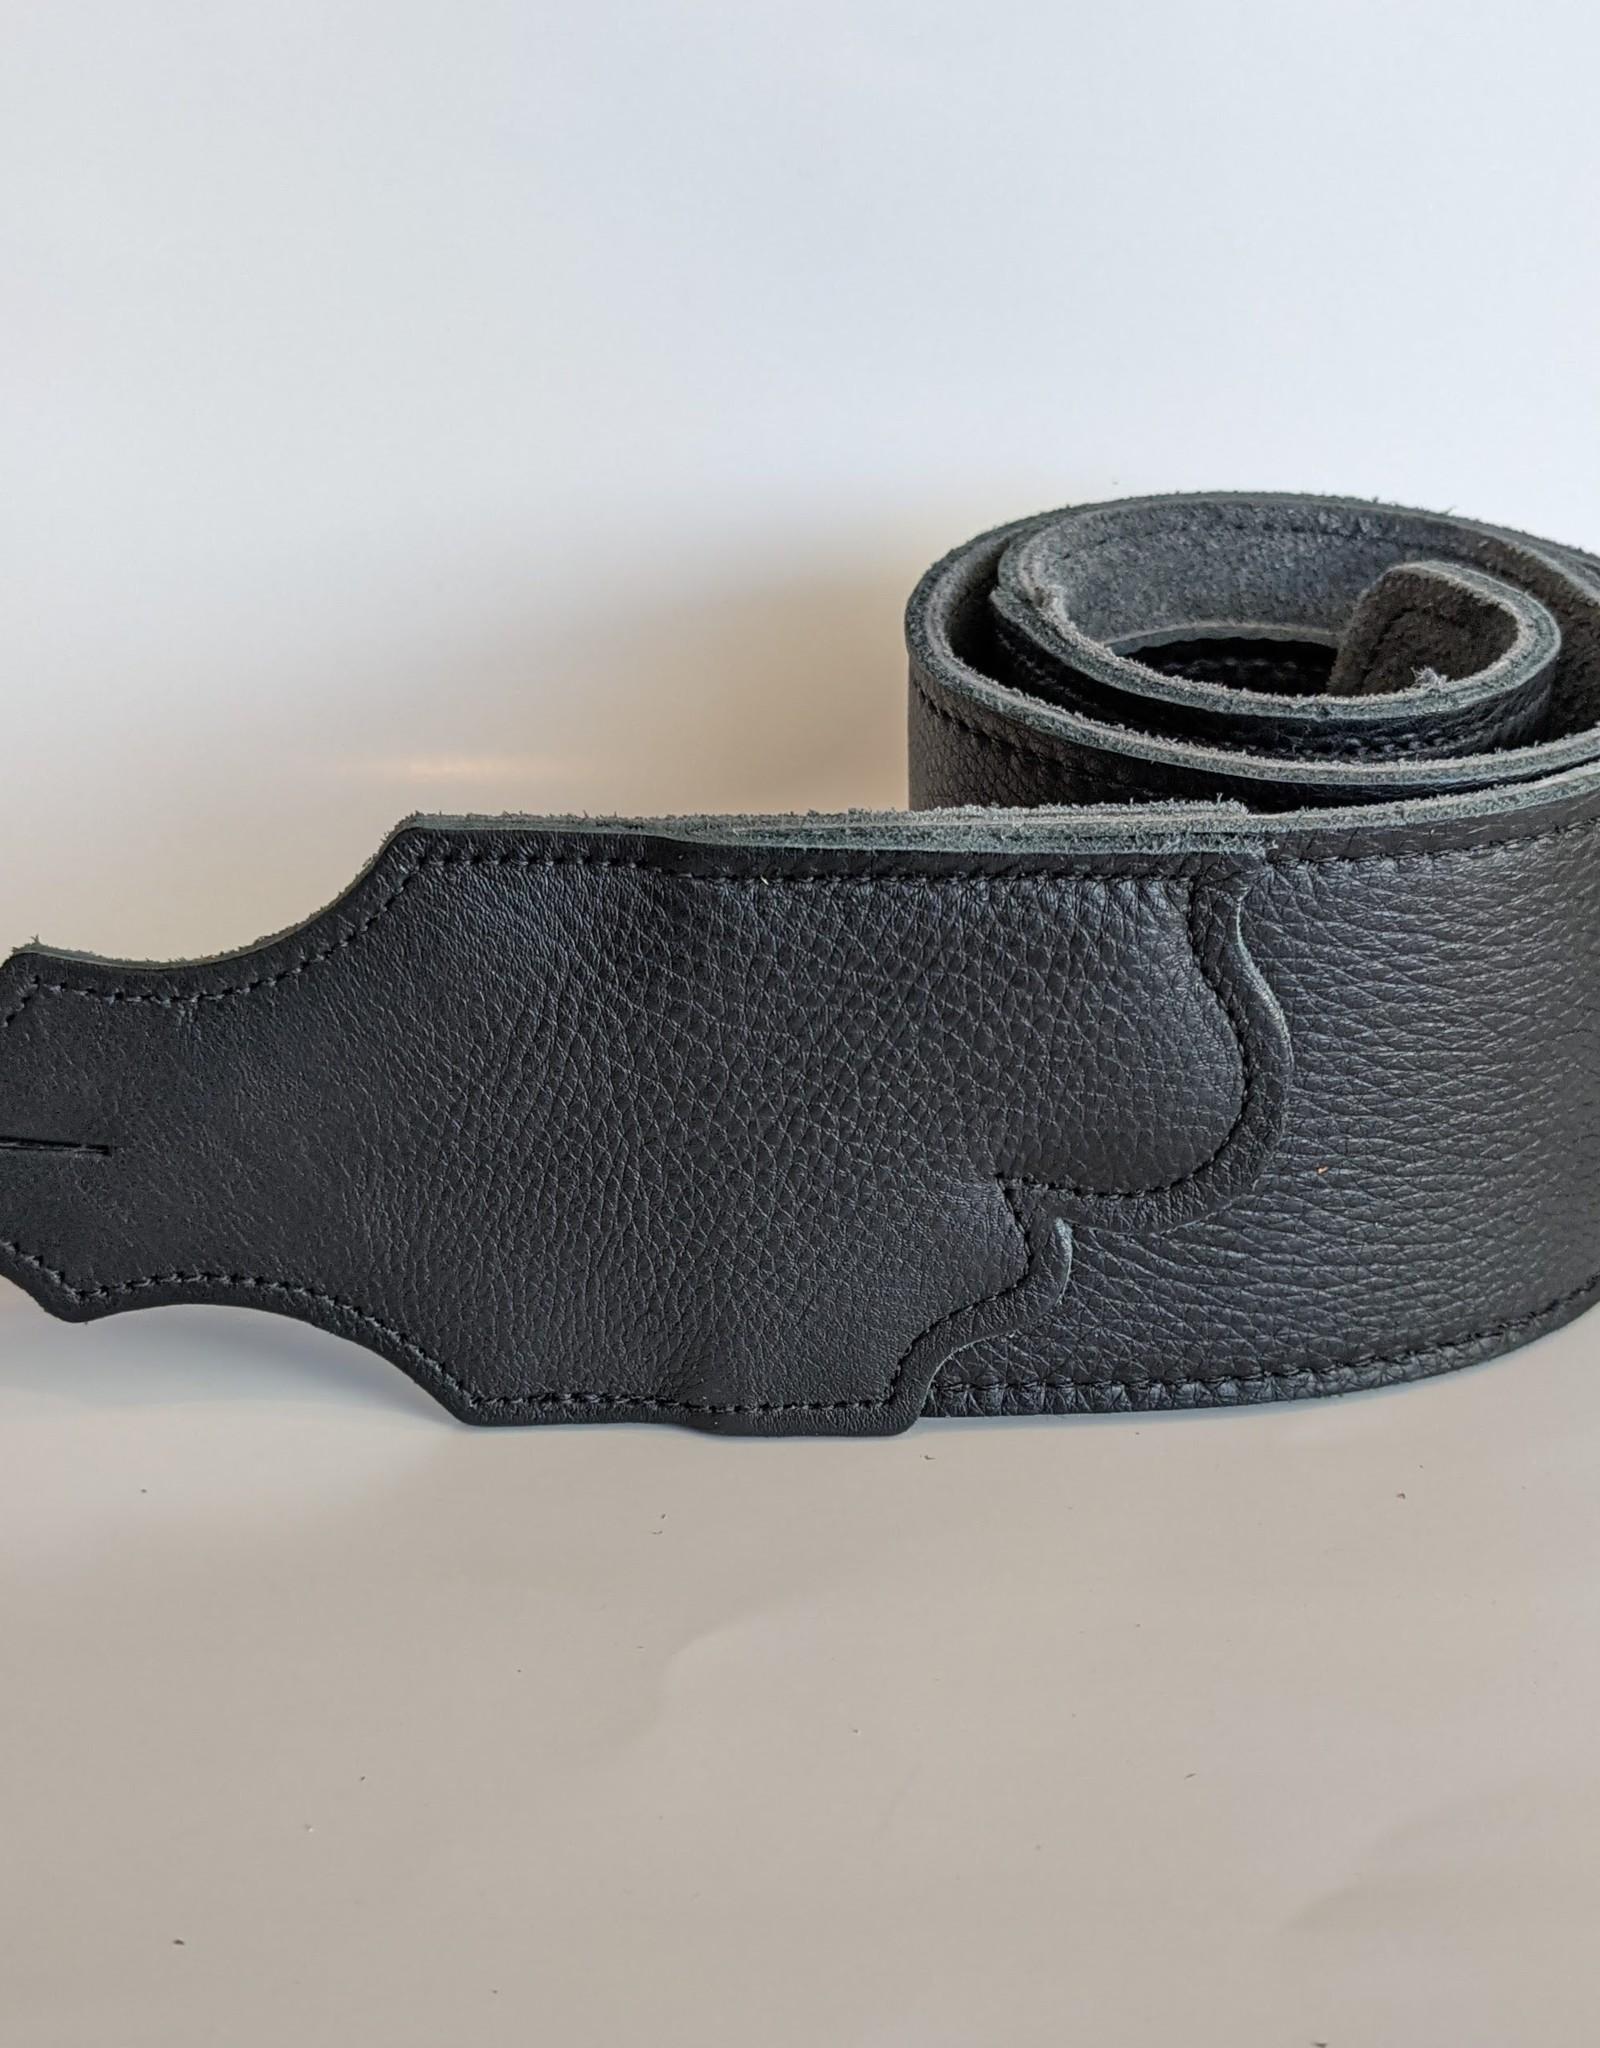 Franklin Straps Black Glove Leather/Black Stitching 3 inch